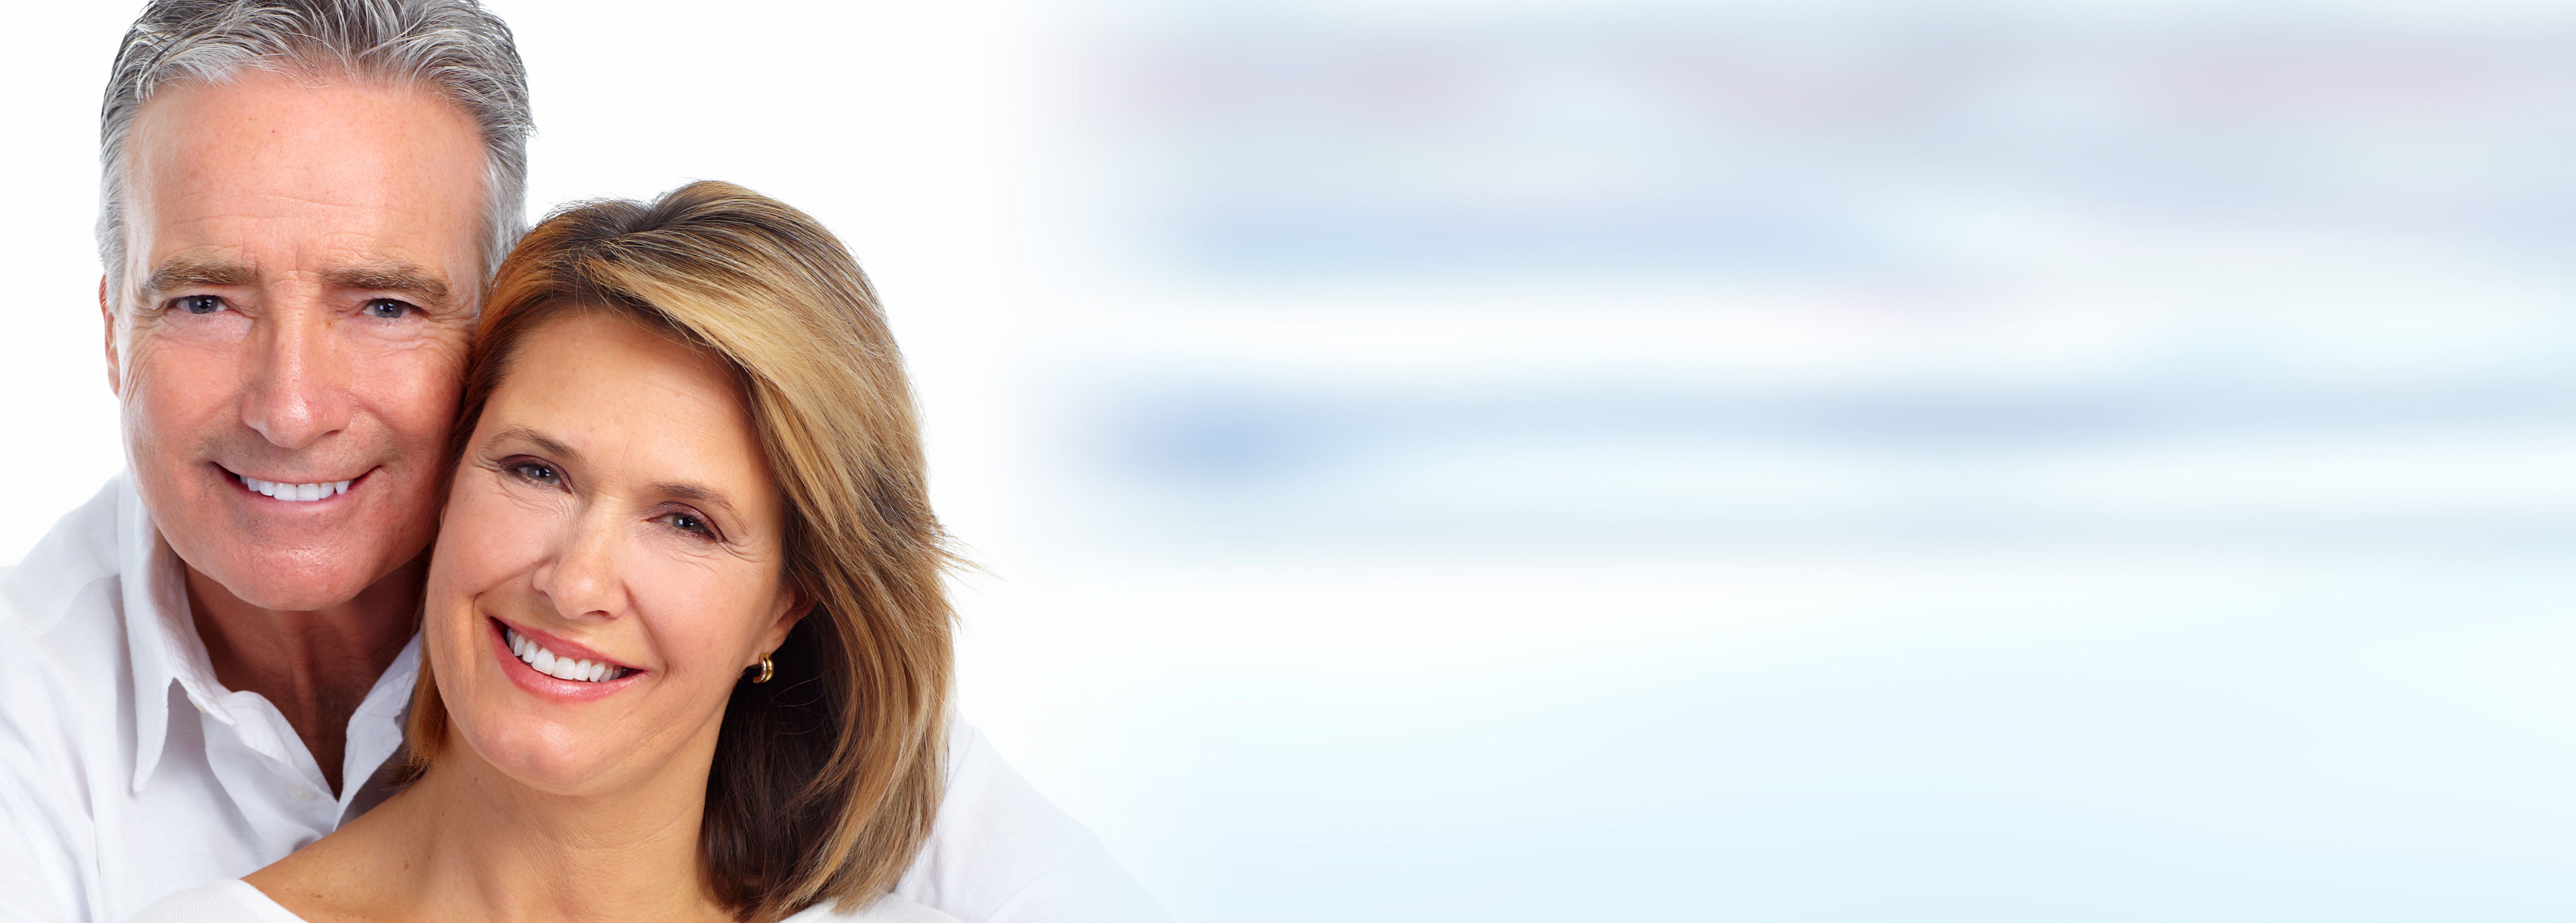 Omni Dermatology – Dermatologist Phoenix 85018, 85037, Mohs